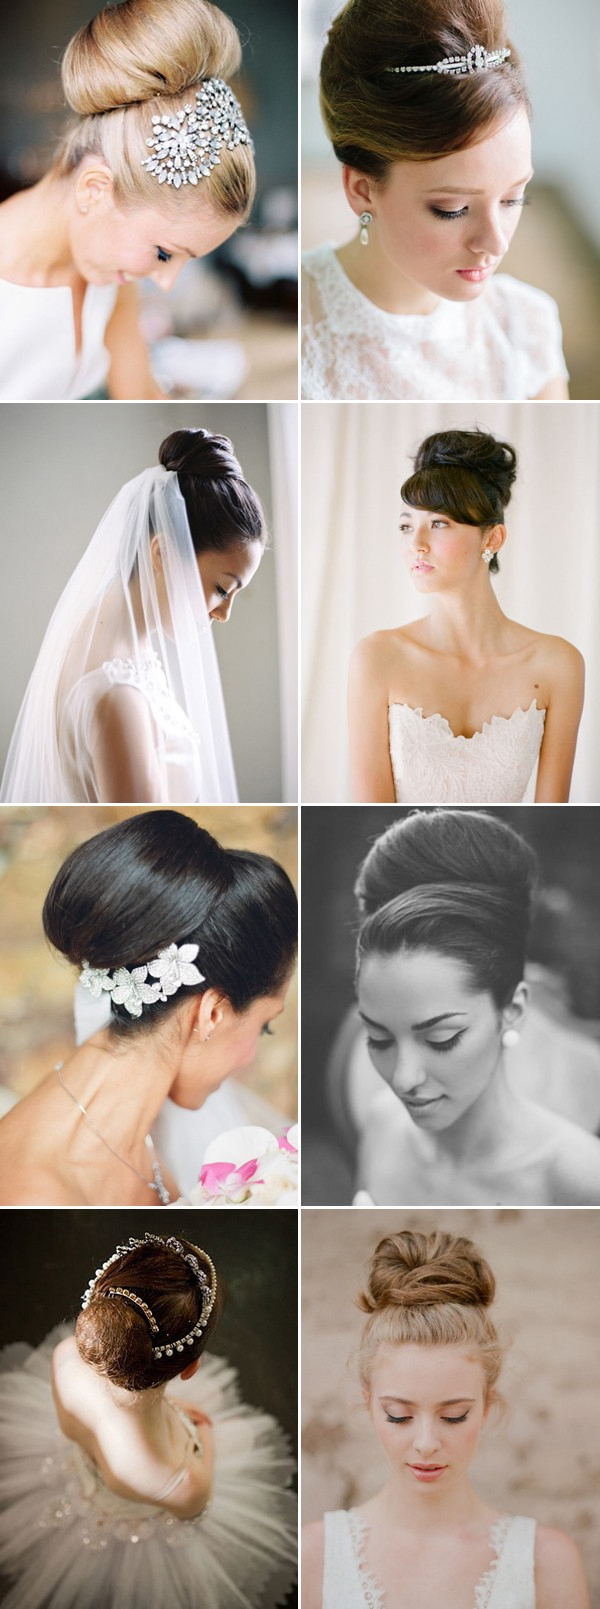 audrey-hepburn-style-classic-bun-wedding-updos